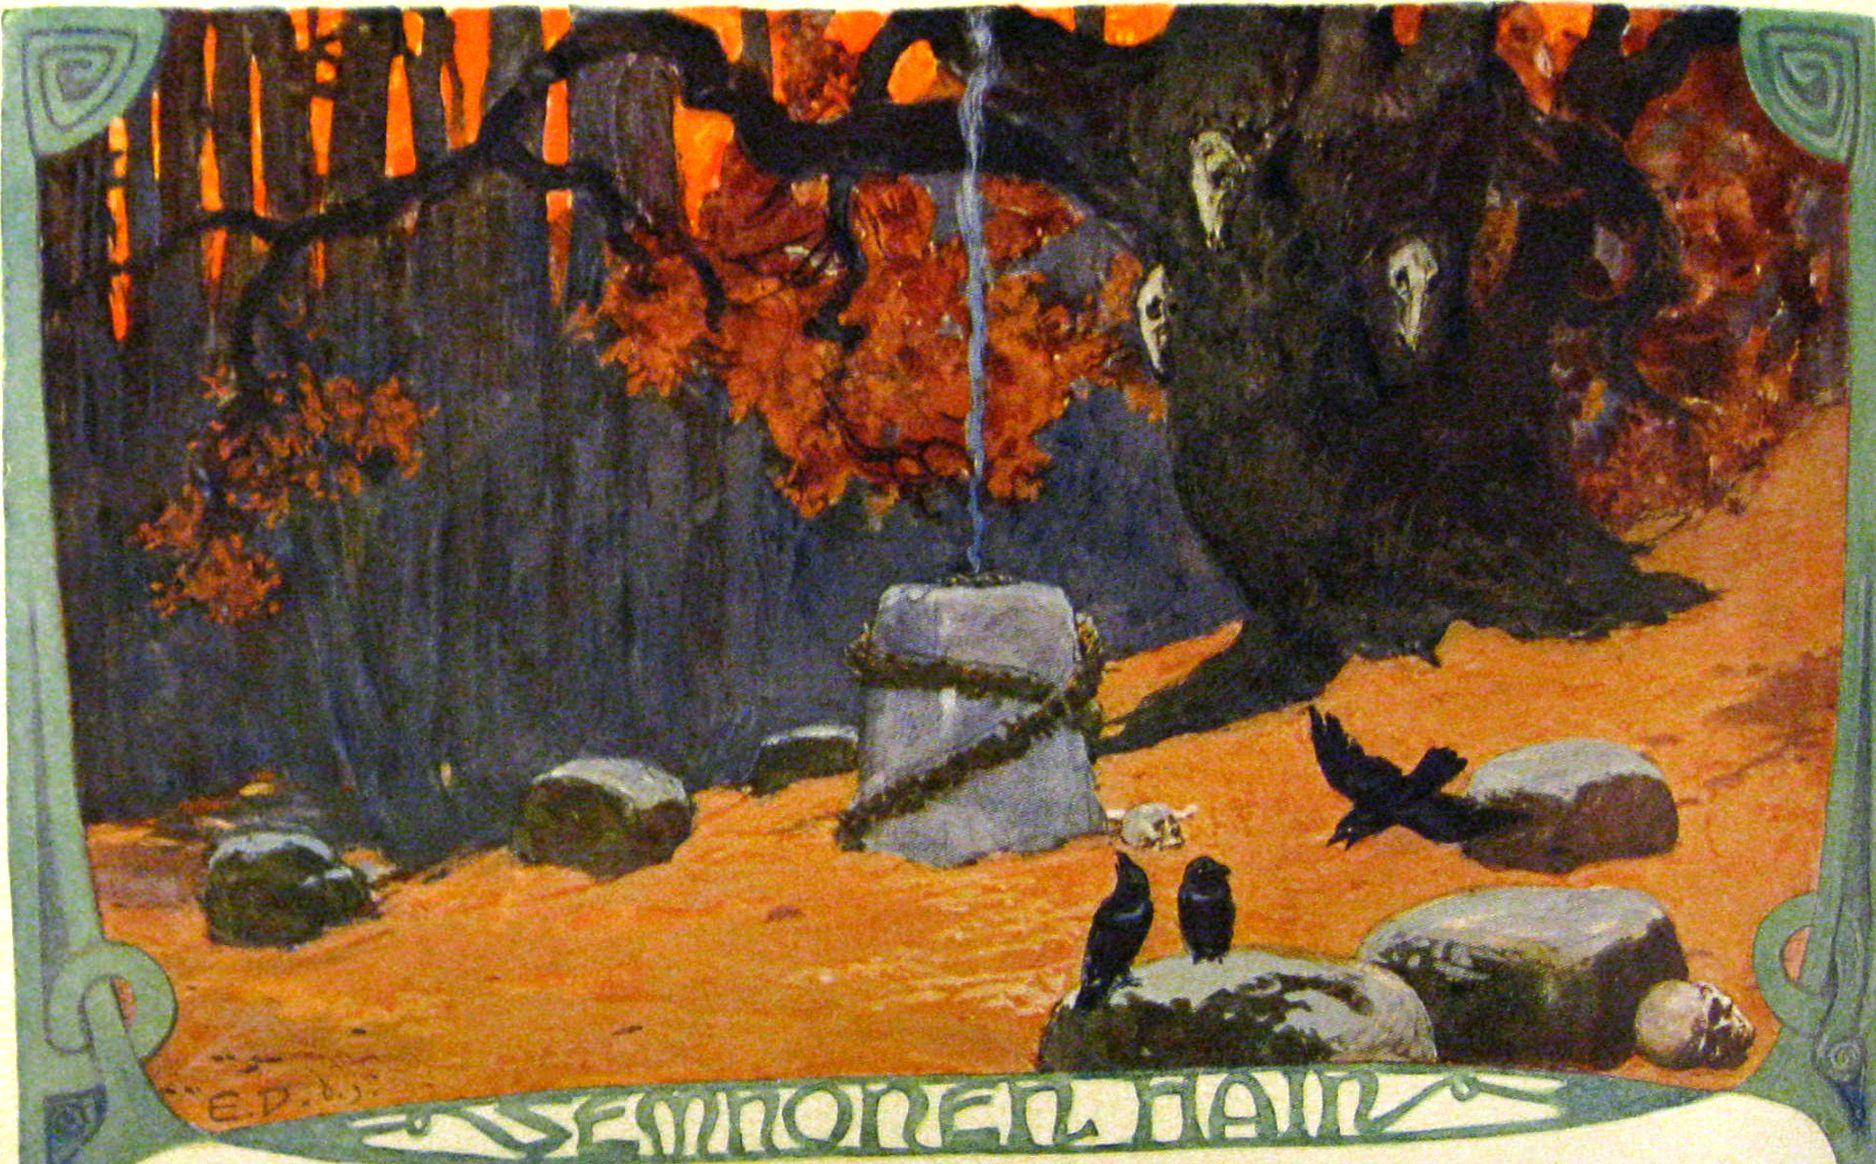 Emil doepler's illustrations of germanic mythology Dying                Nature Search